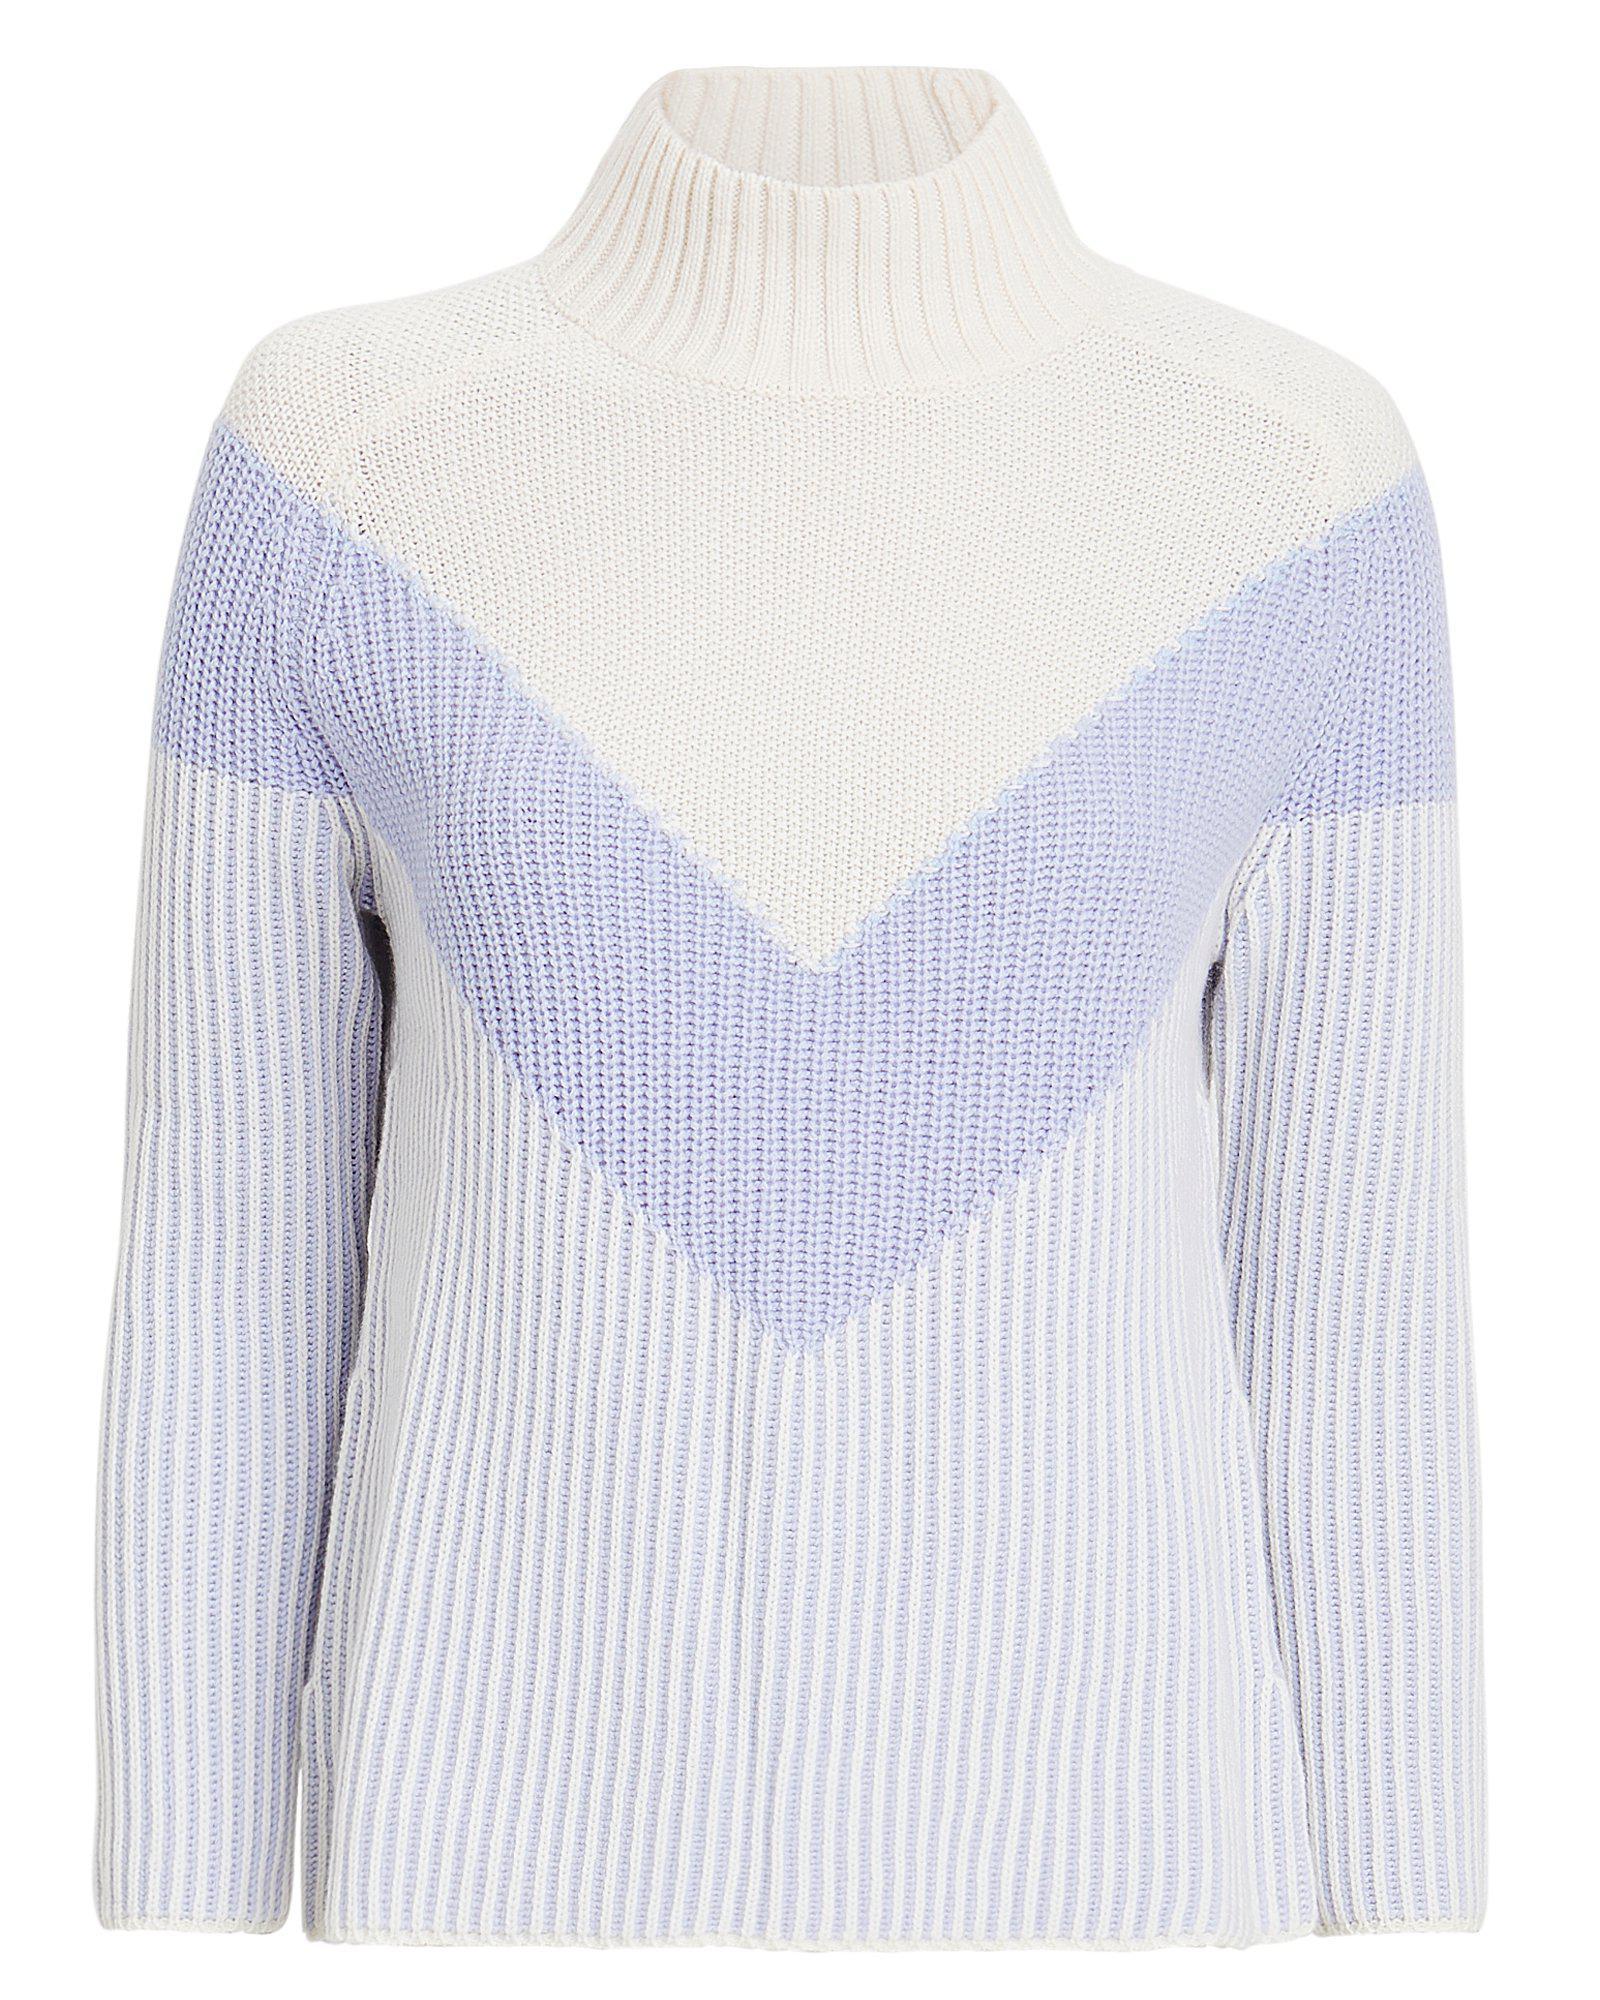 377846bb1c76 Blue Jordan Graham Lyst In Sweater Zoe wYOnxX